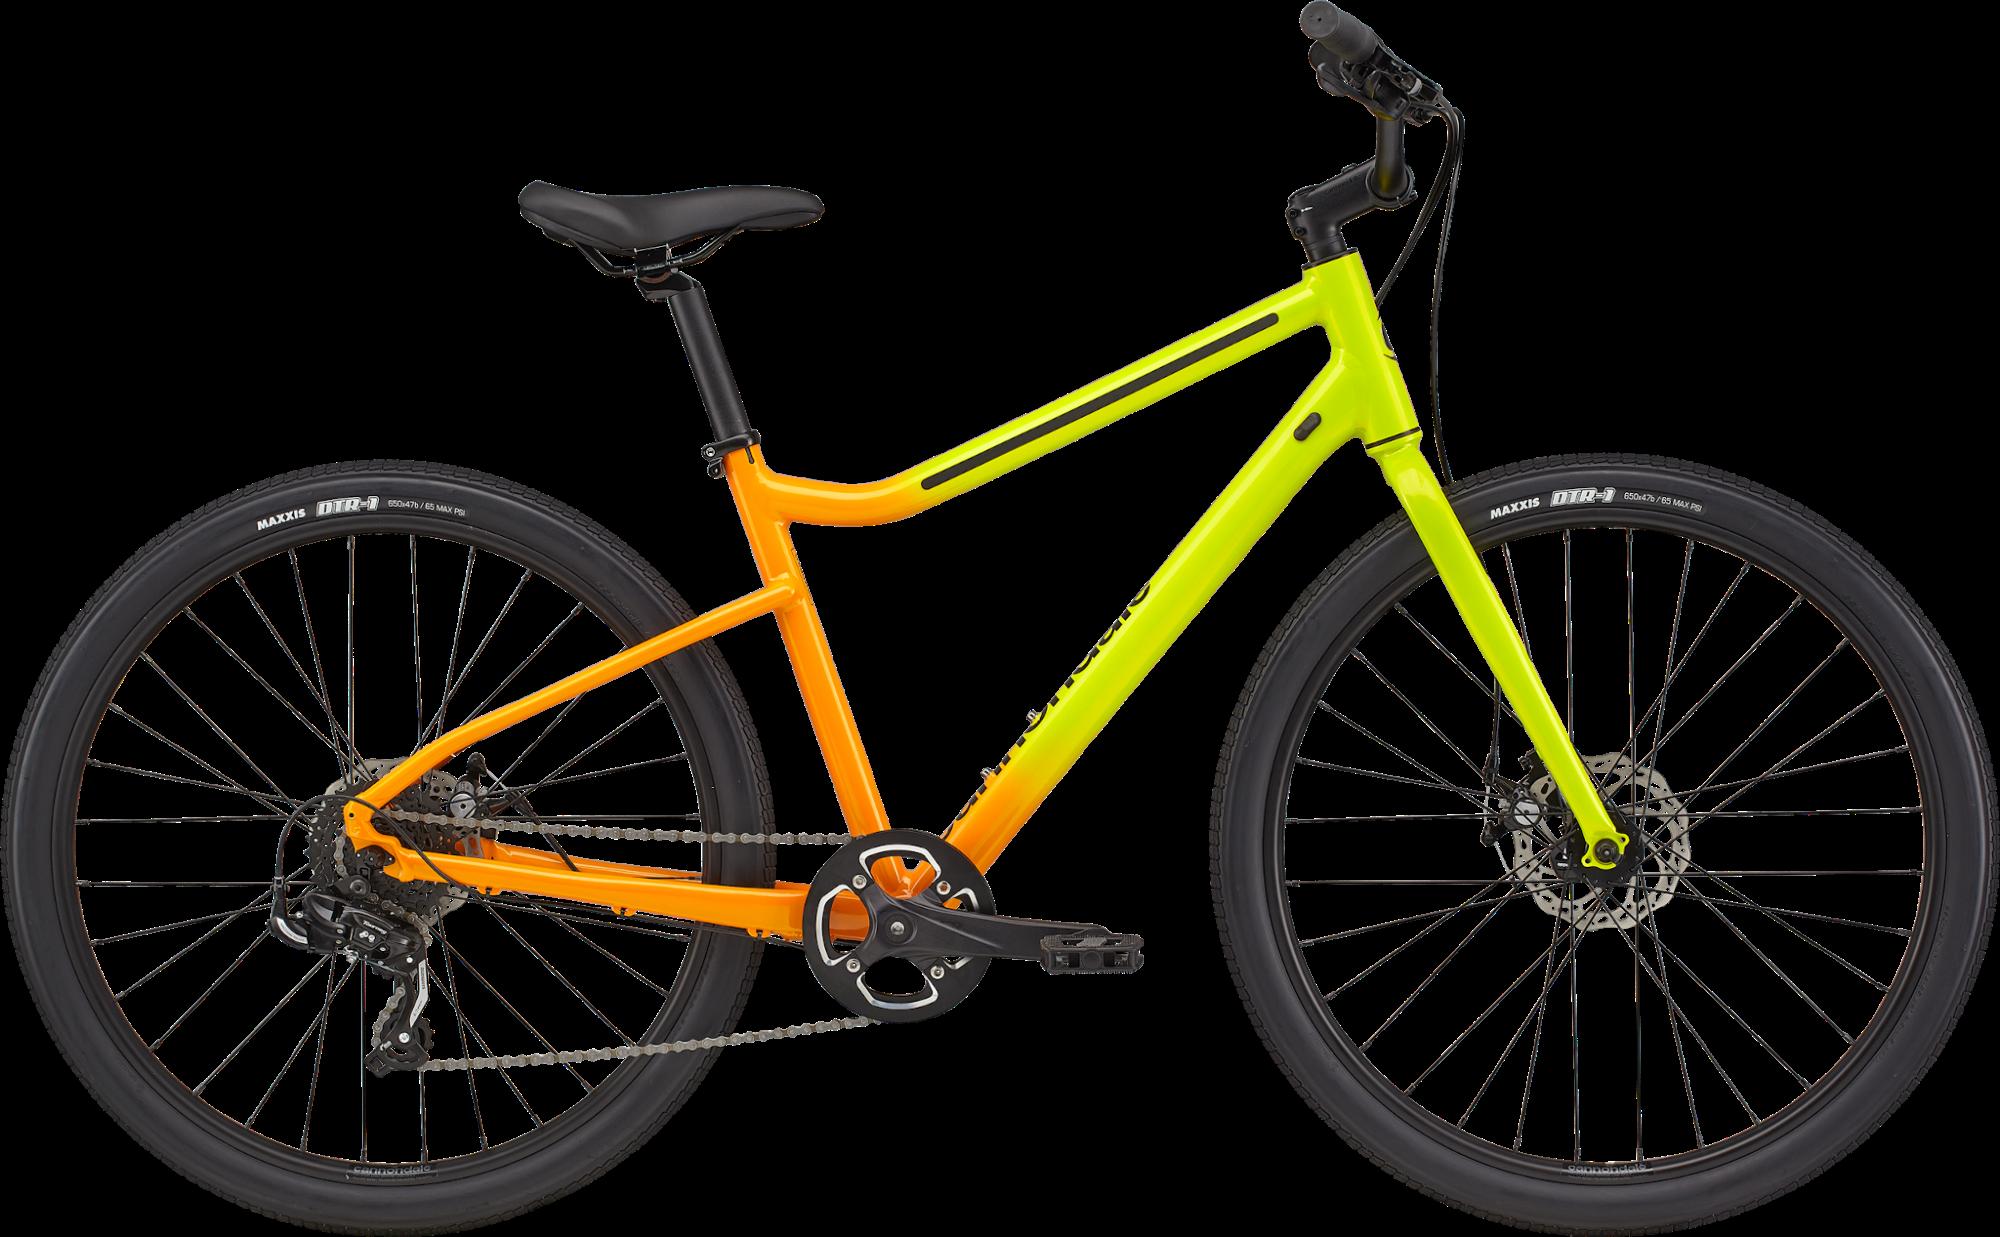 Cannondale Treadwell 3 Ltd Disc Hybrid Bike 2021 Highlighter Fade